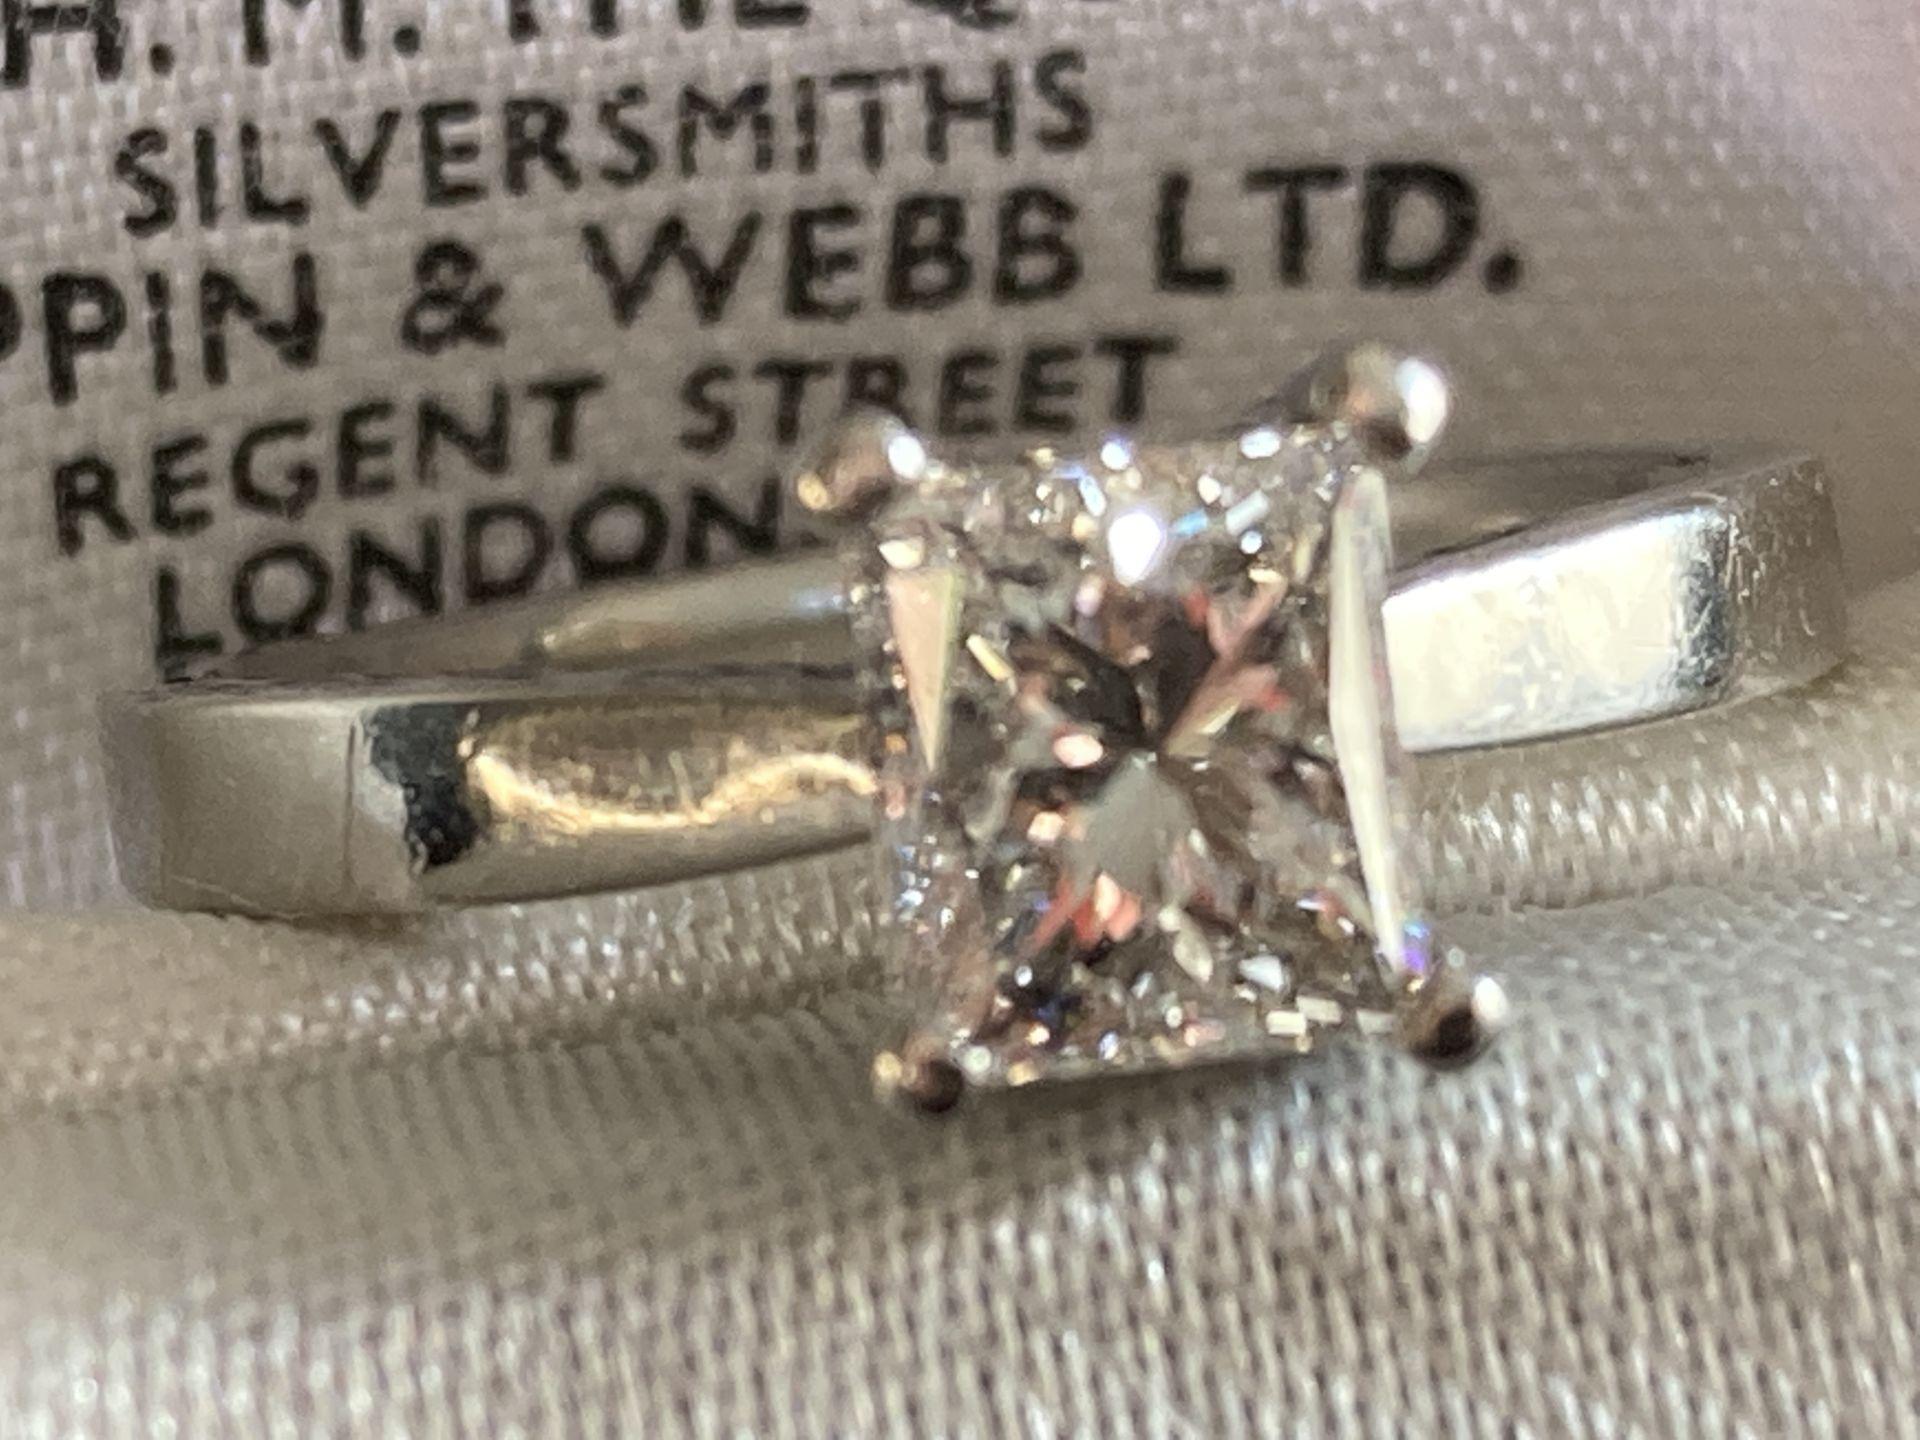 1.04CT (VS/F) PLATINUM PRINCESS CUT DIAMOND SOLITAIRE RING (CERTIFICATED) - Image 6 of 10